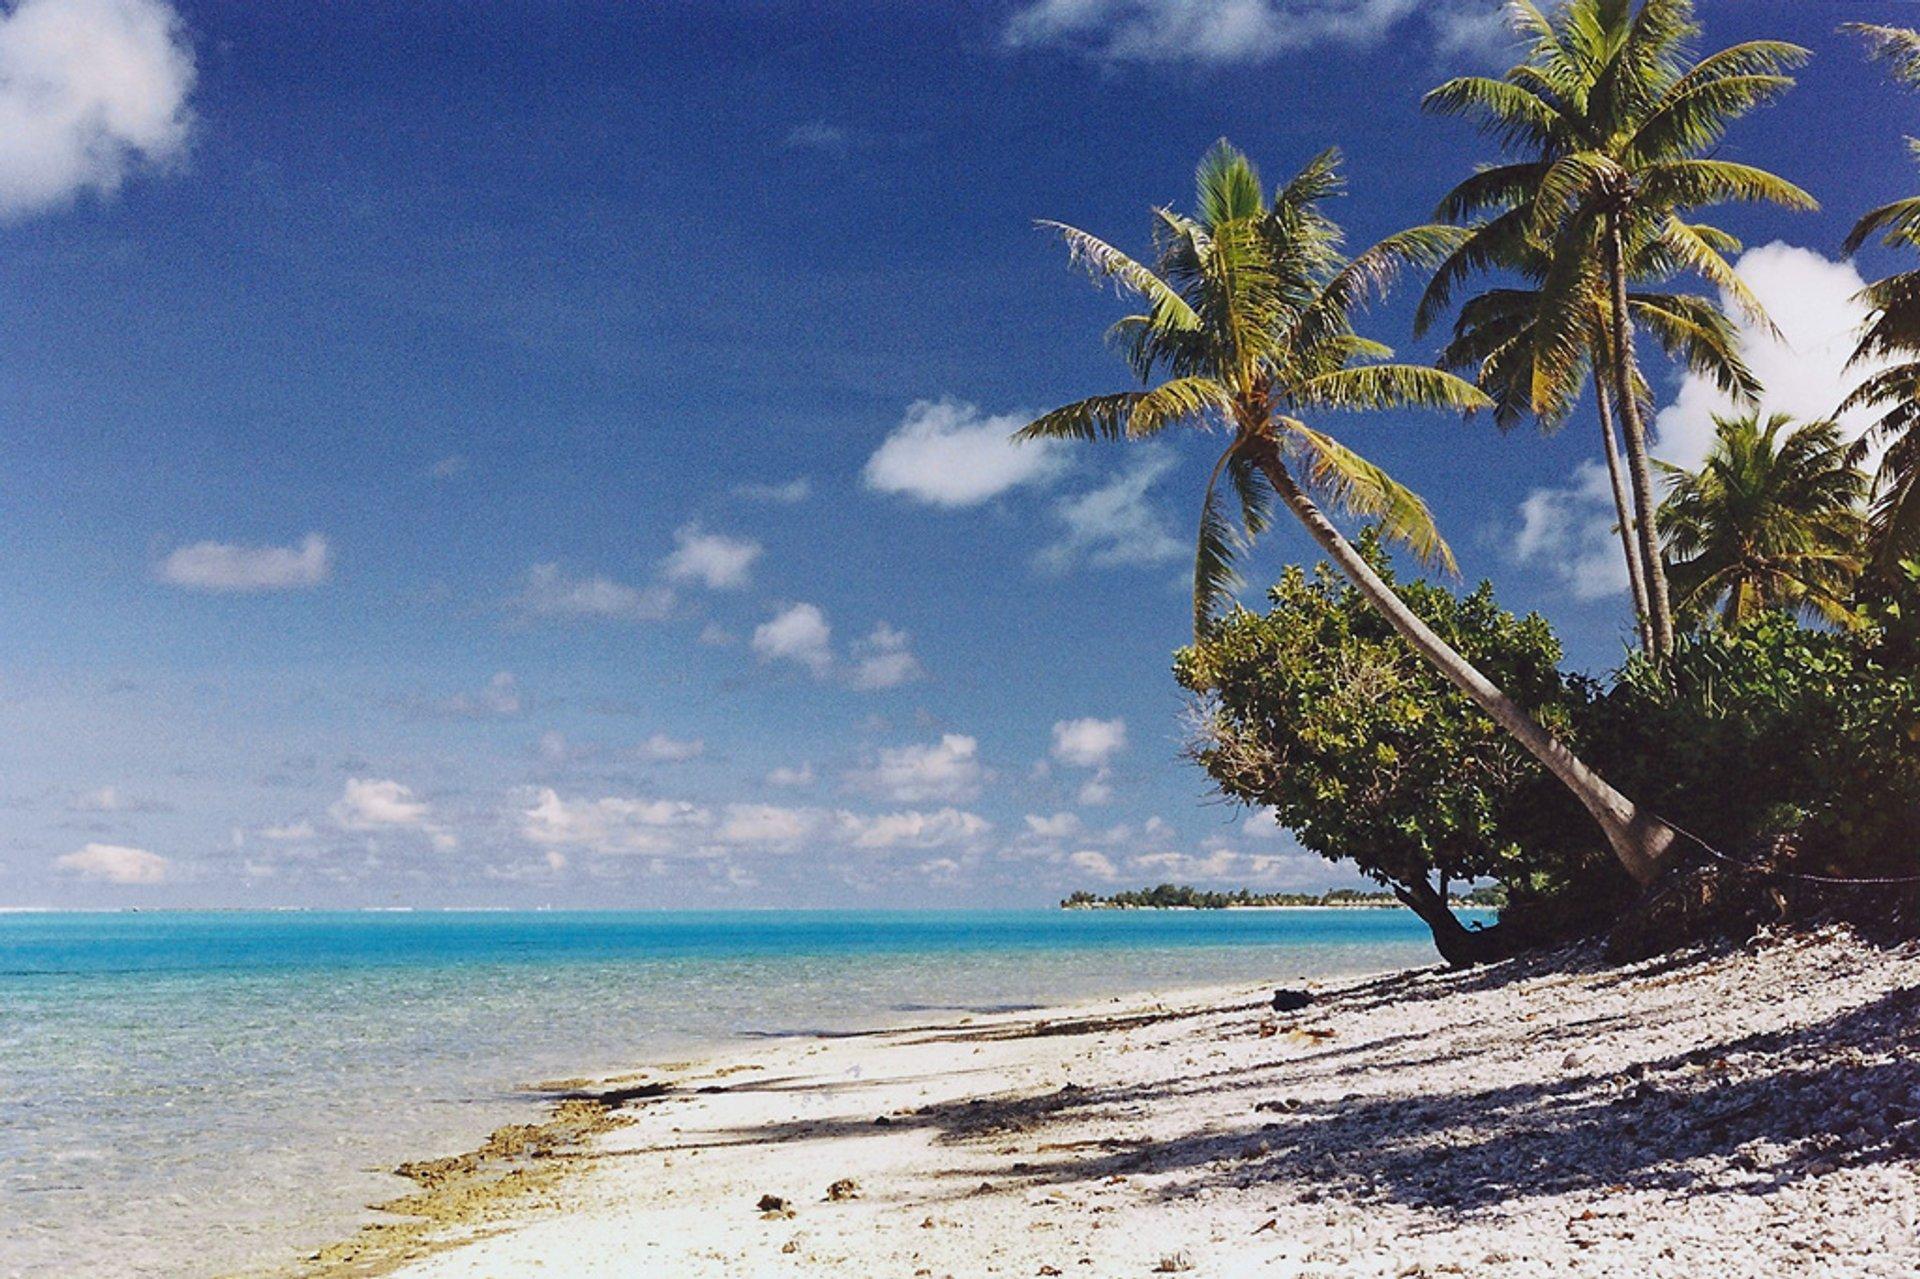 Winter: Dry Season in Bora Bora 2019 - Best Time